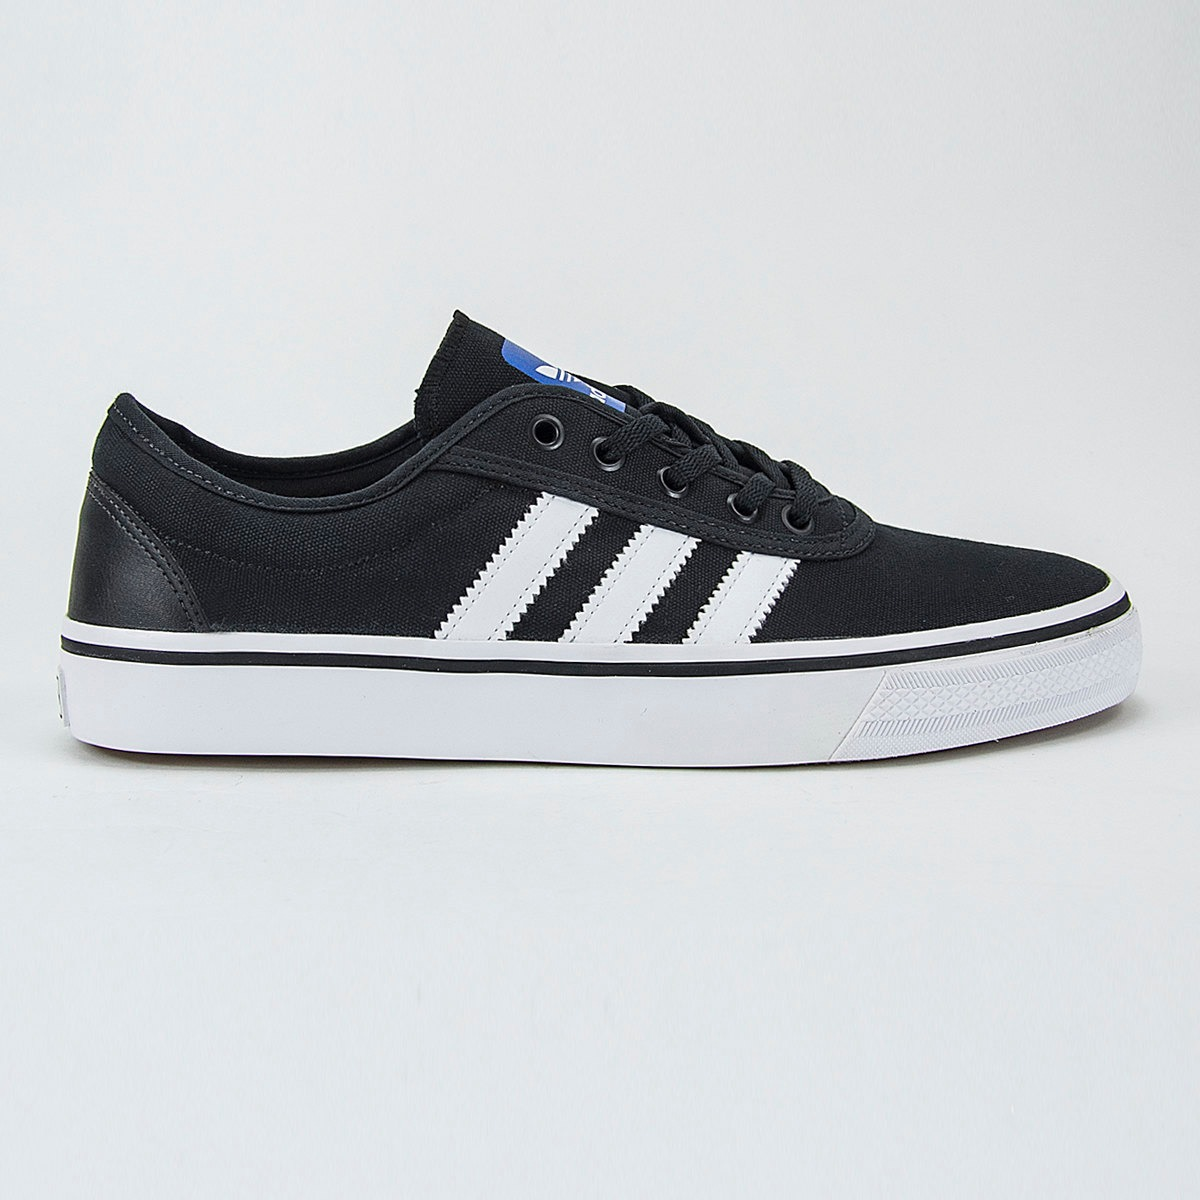 Zapatillas Adi-ease adidas Fluid Tienda Oficial -   1.995 3e6d3849f6e1b